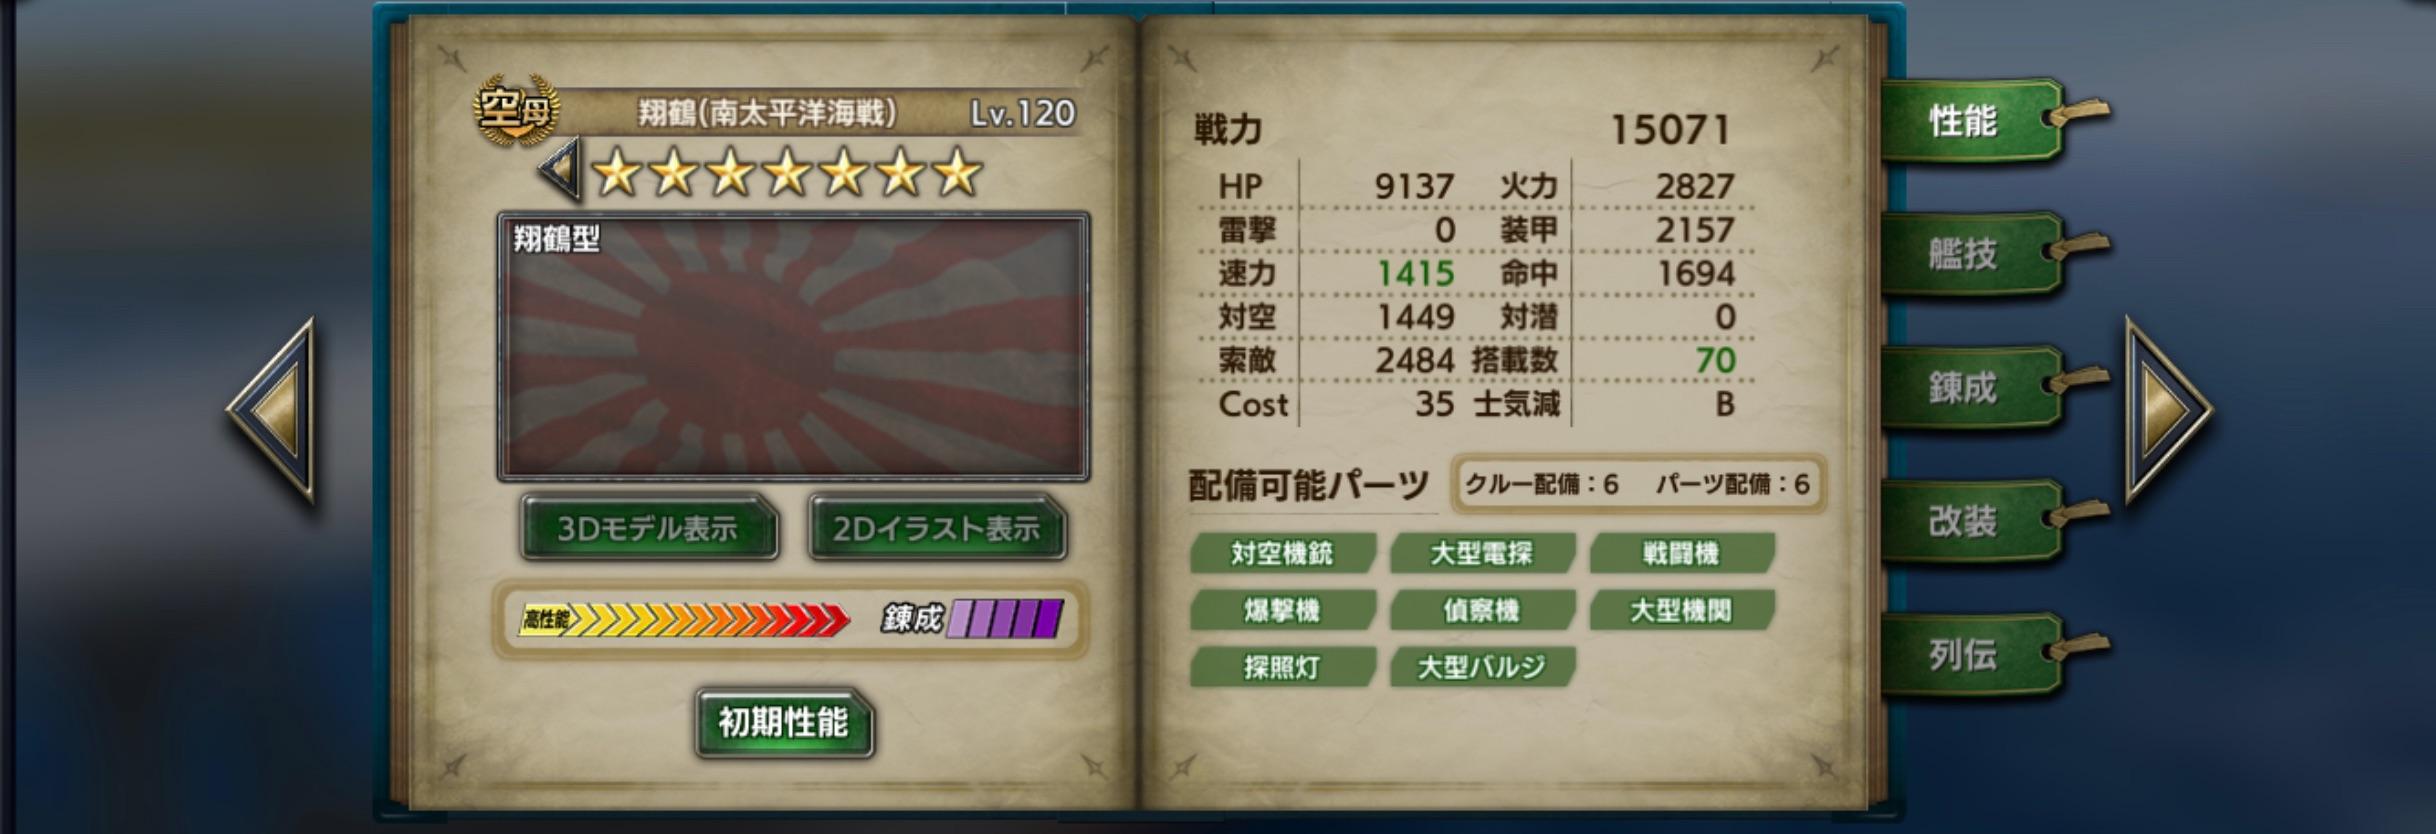 ShokakuS-performance